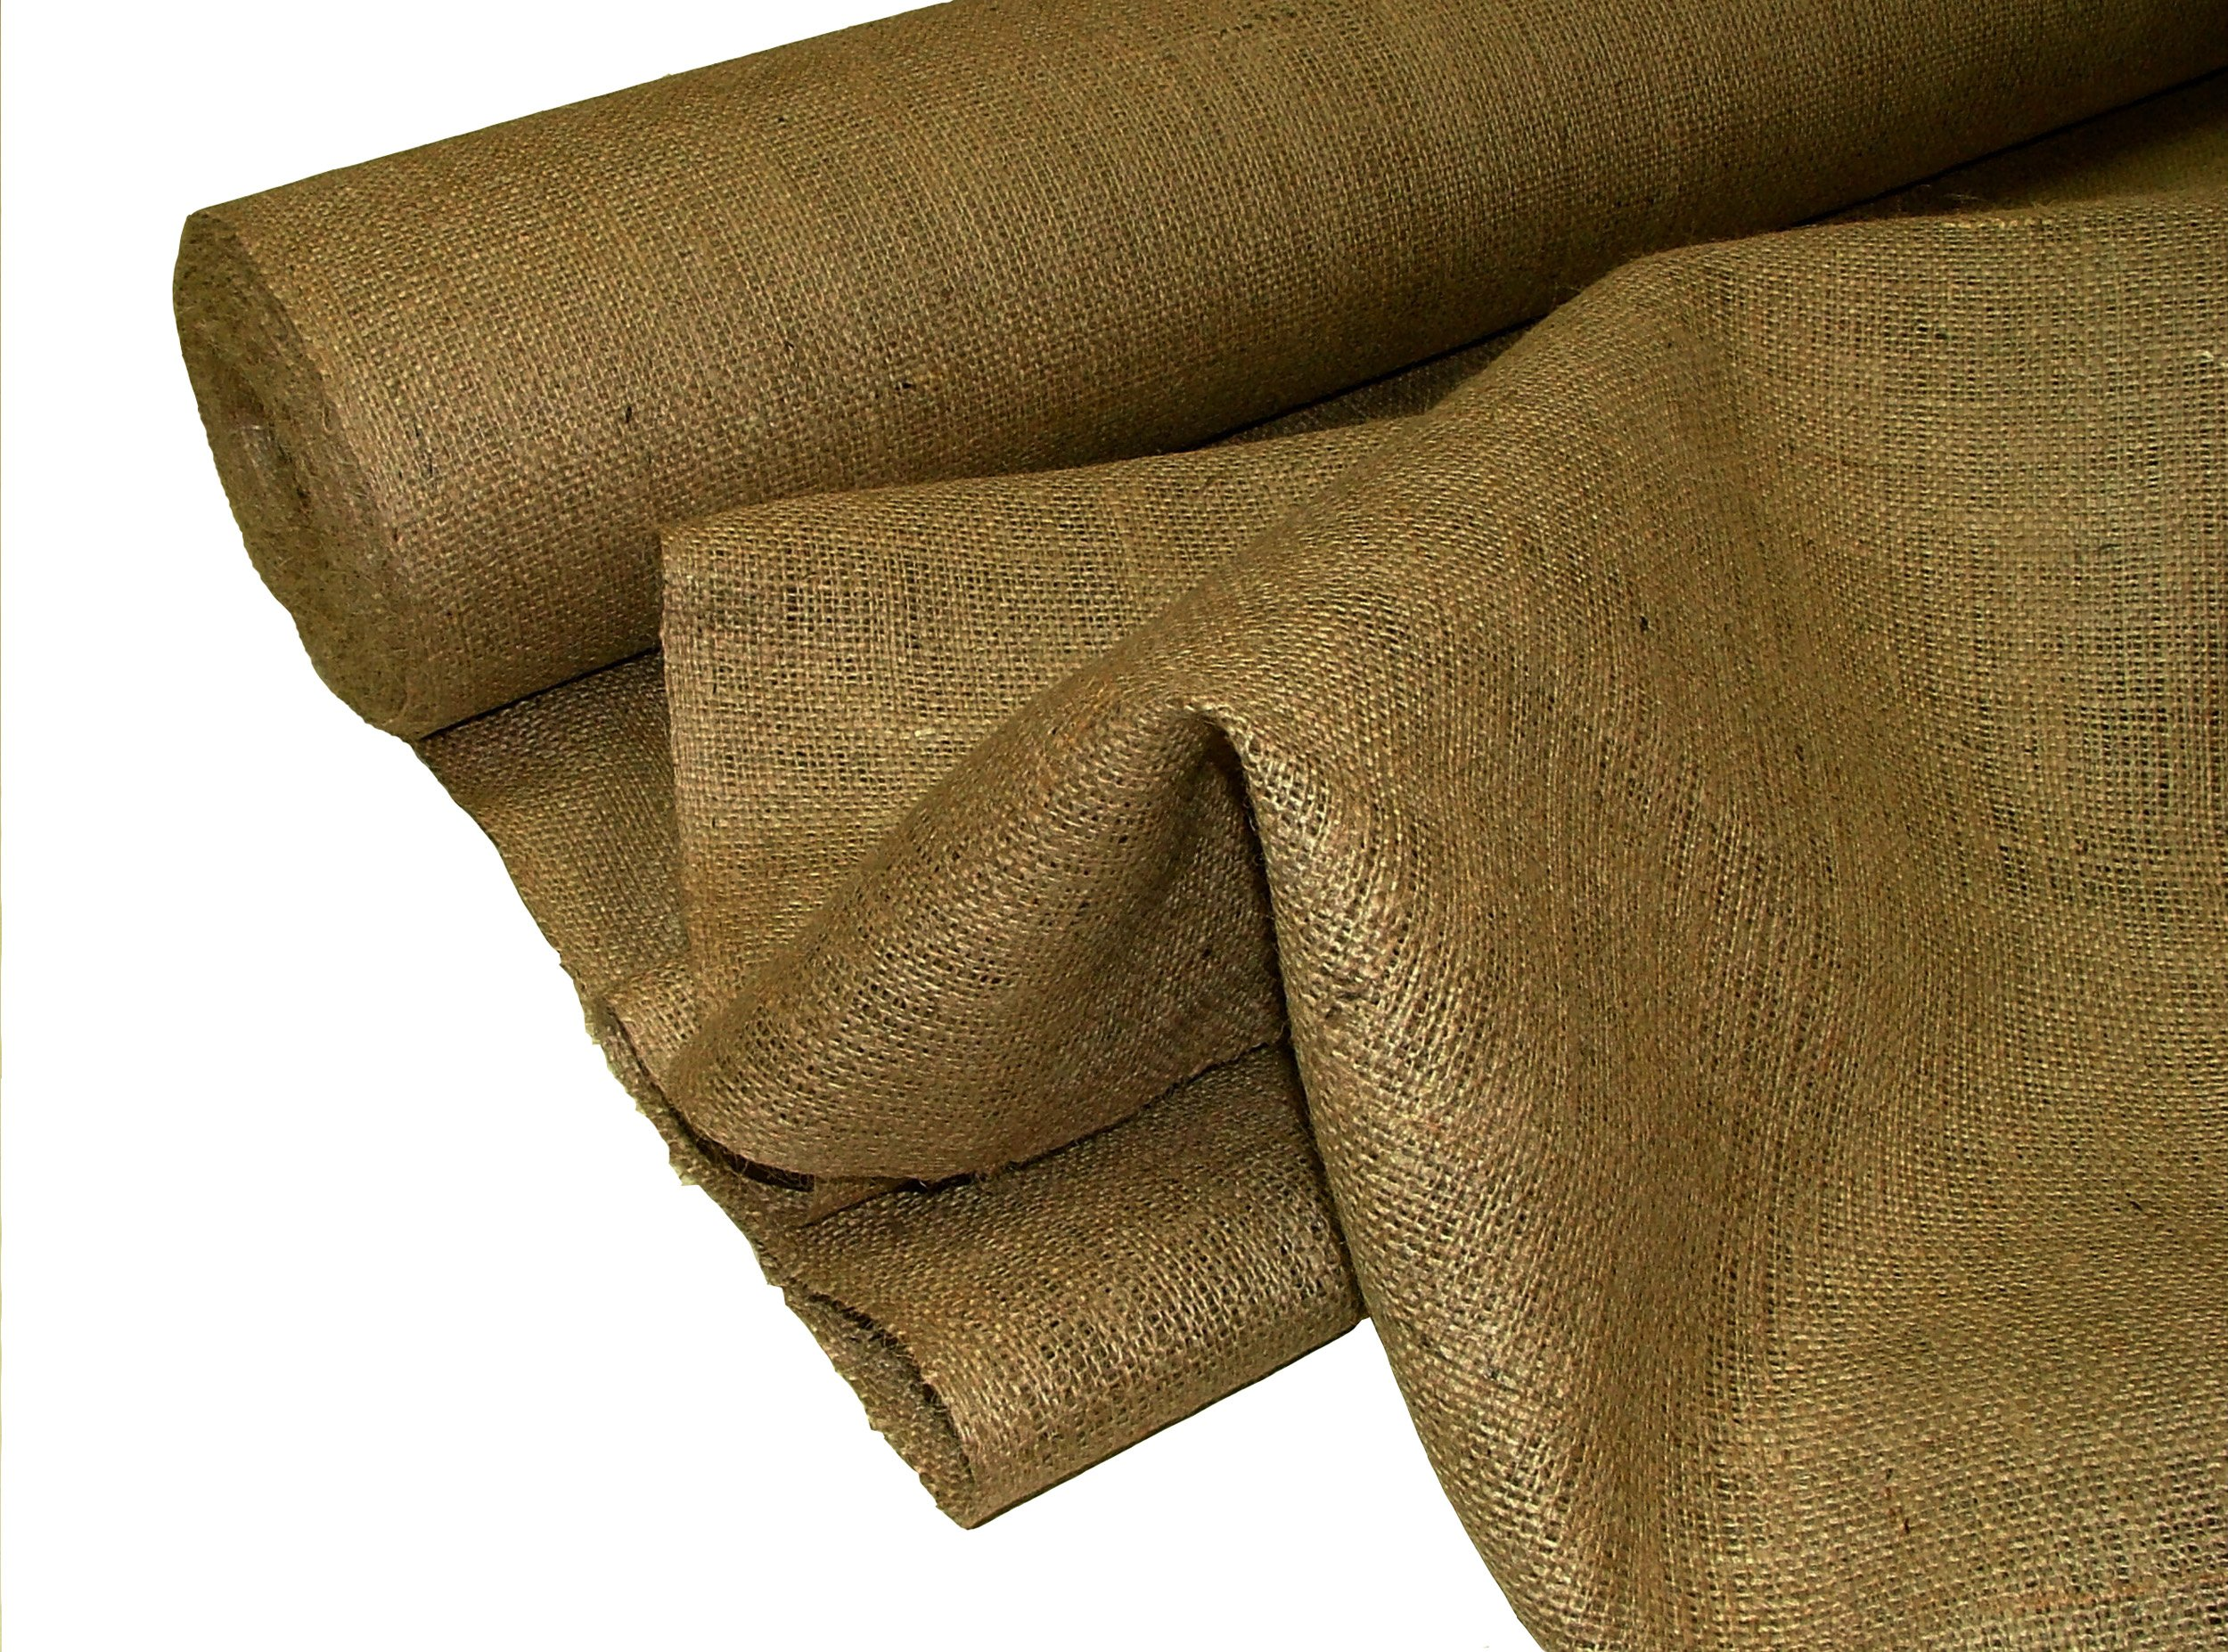 Pandoras Upholstery - Tela de arpillera (10 m), color marrón product image